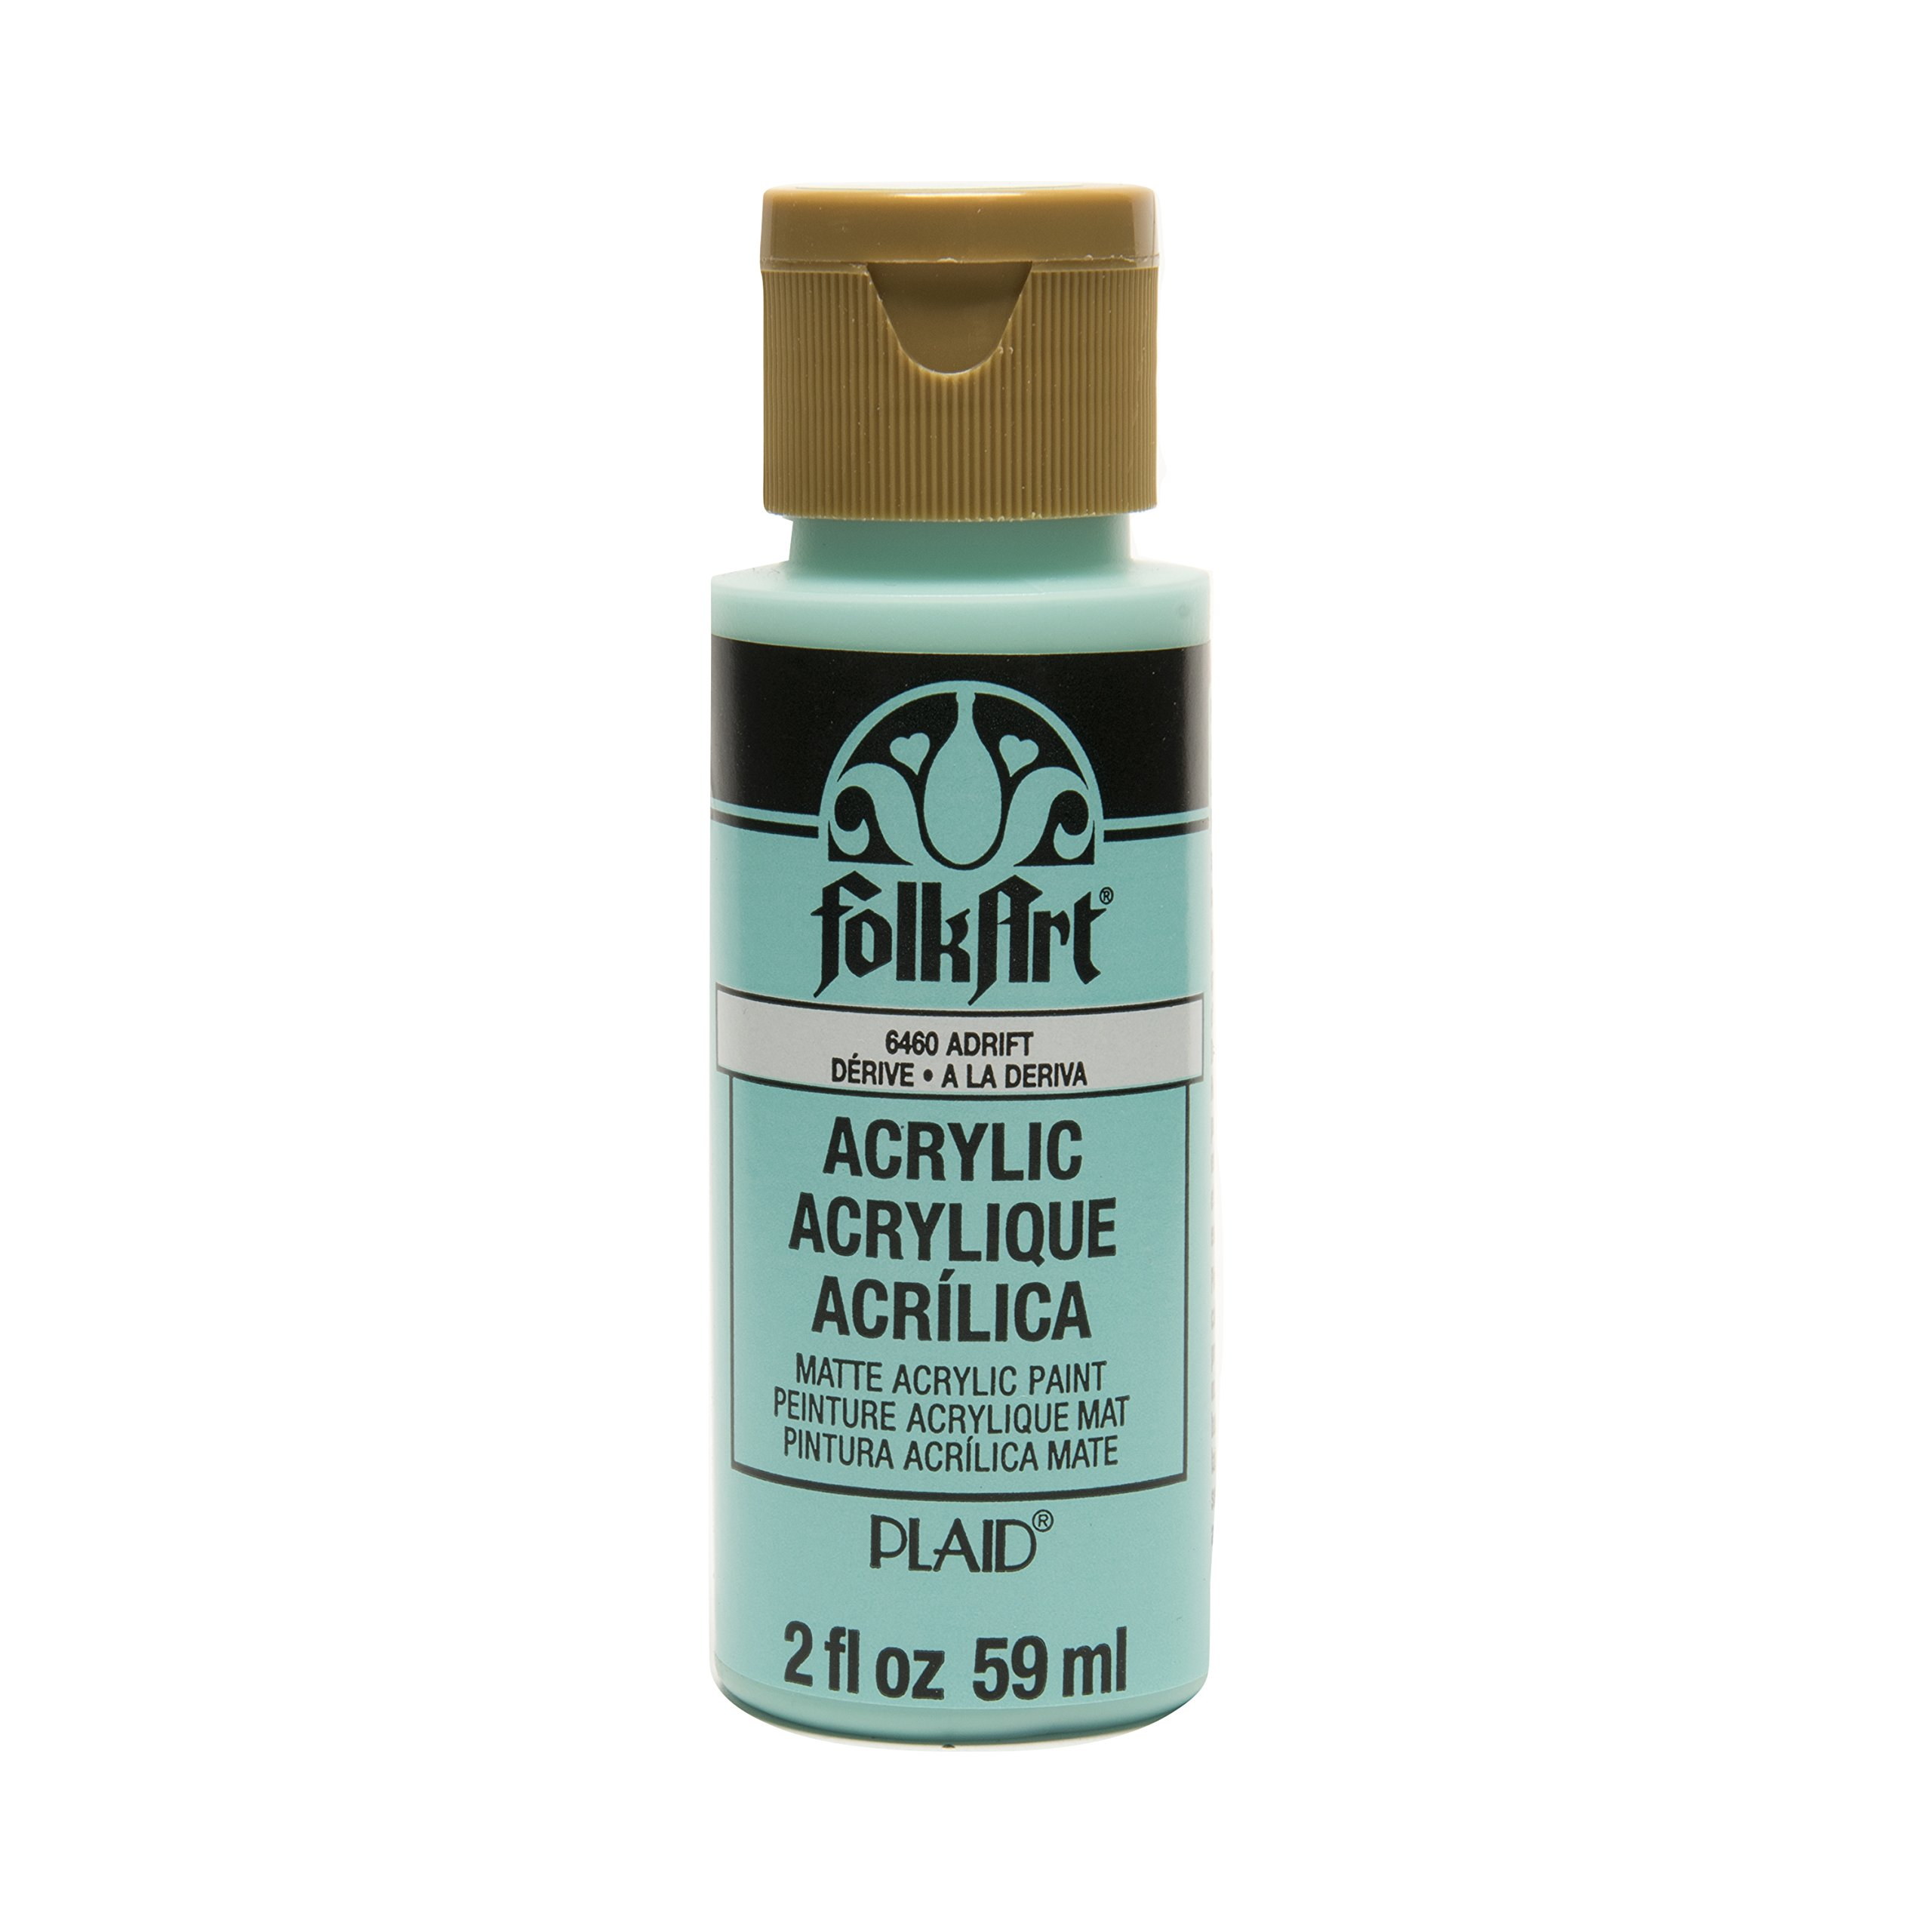 FolkArt Acrylic Paint in Assorted Colors (2 oz), 6460, Adrift